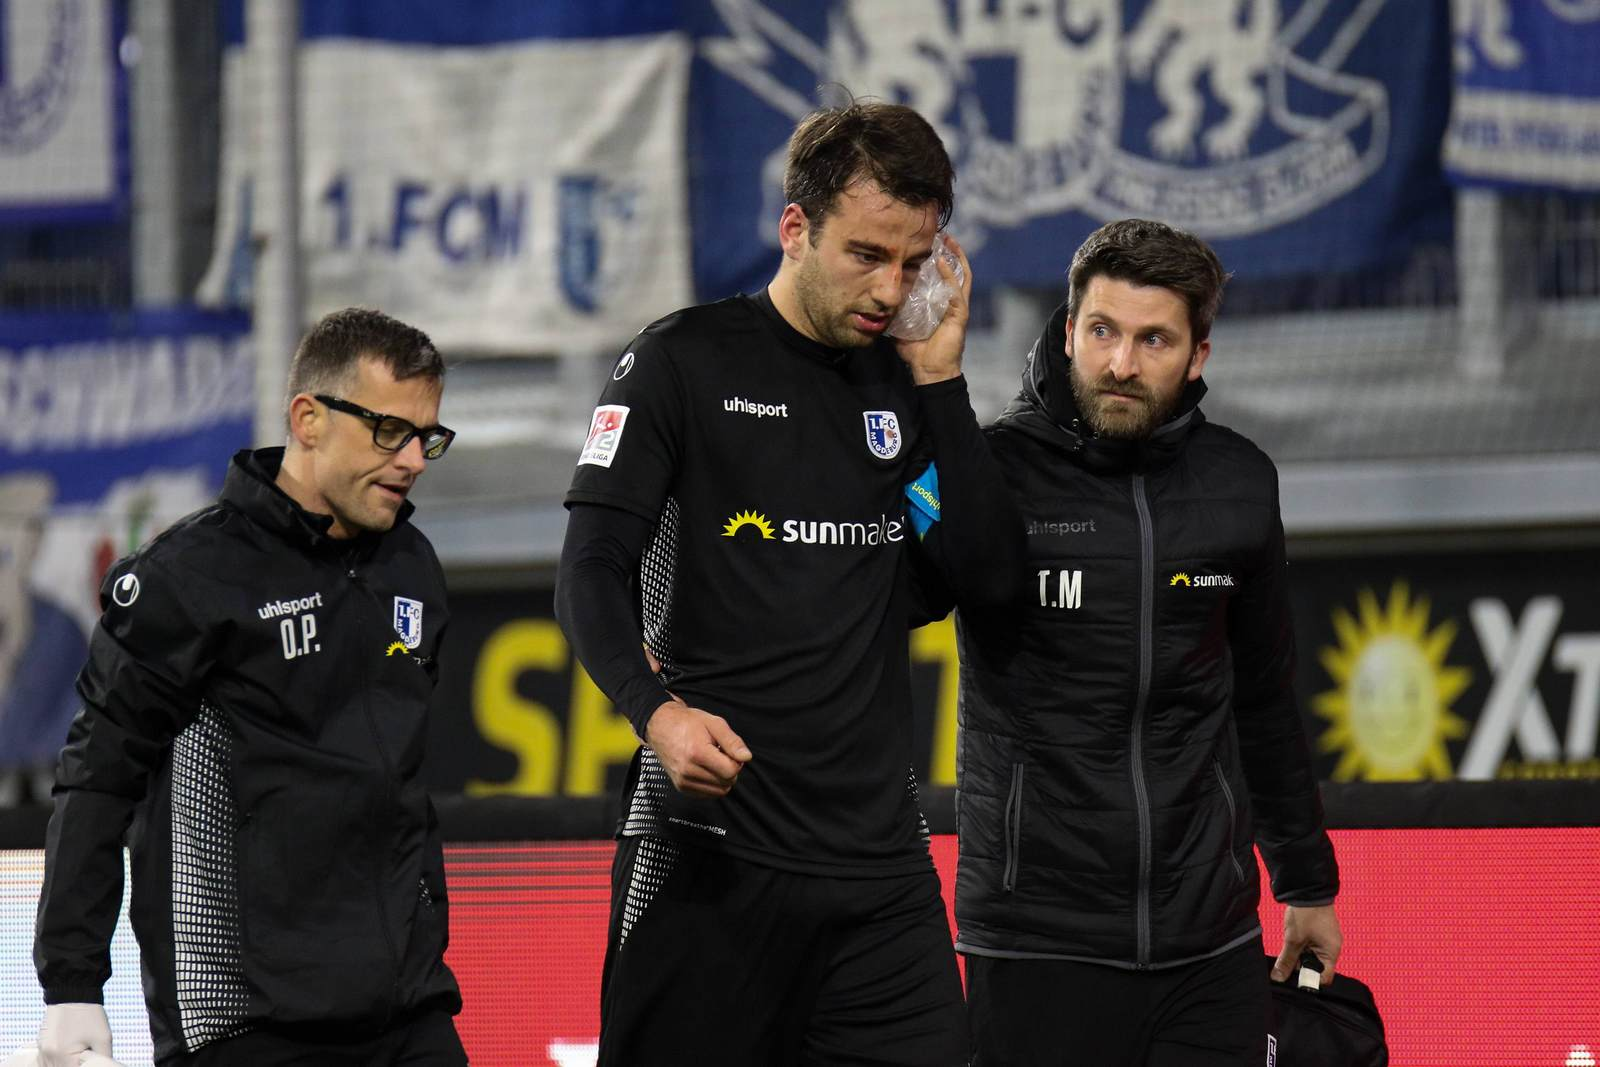 Christian Beck mit den Teamärzten des 1. FC Magdeburg